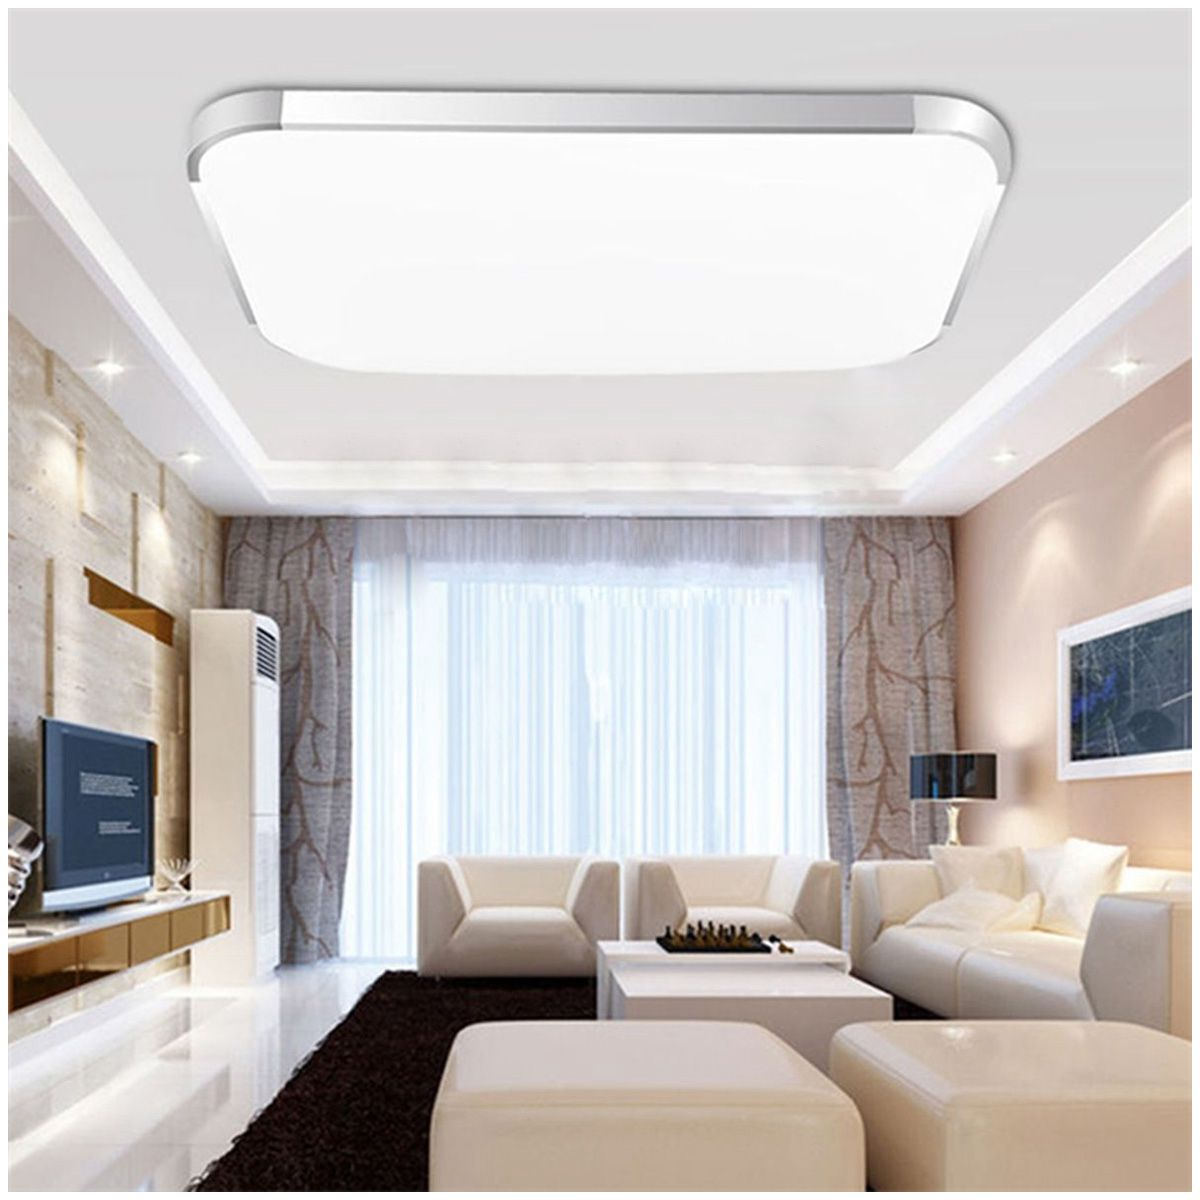 Best Practical Modern Led Ceiling Down Light Bathroom Kitchen Panel ...